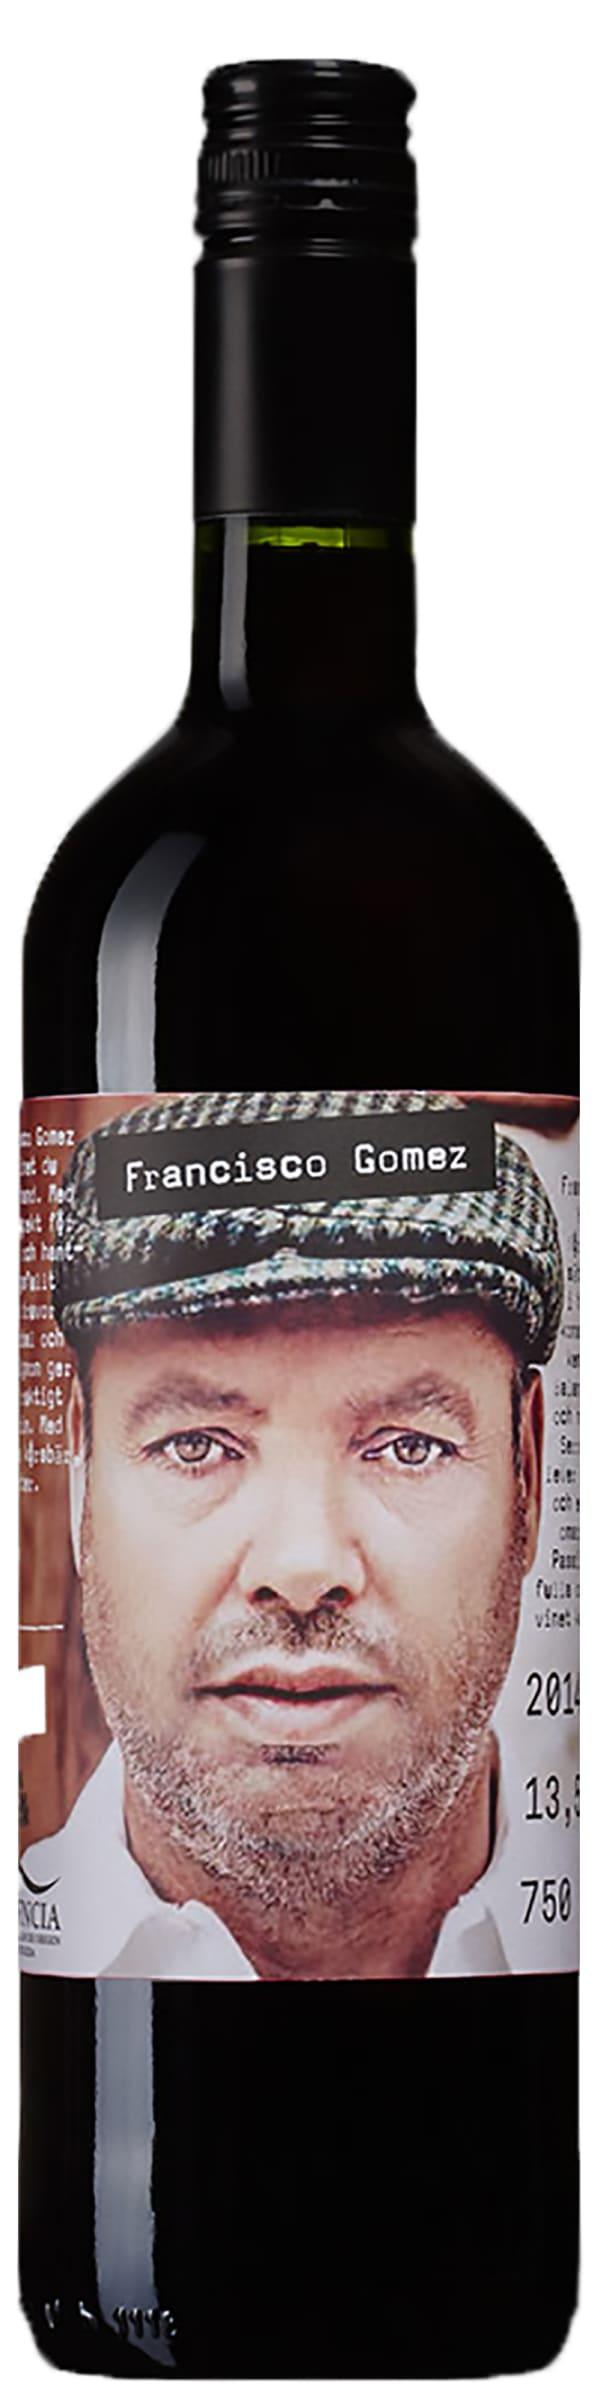 Francisco Gomez Eko Red 2016